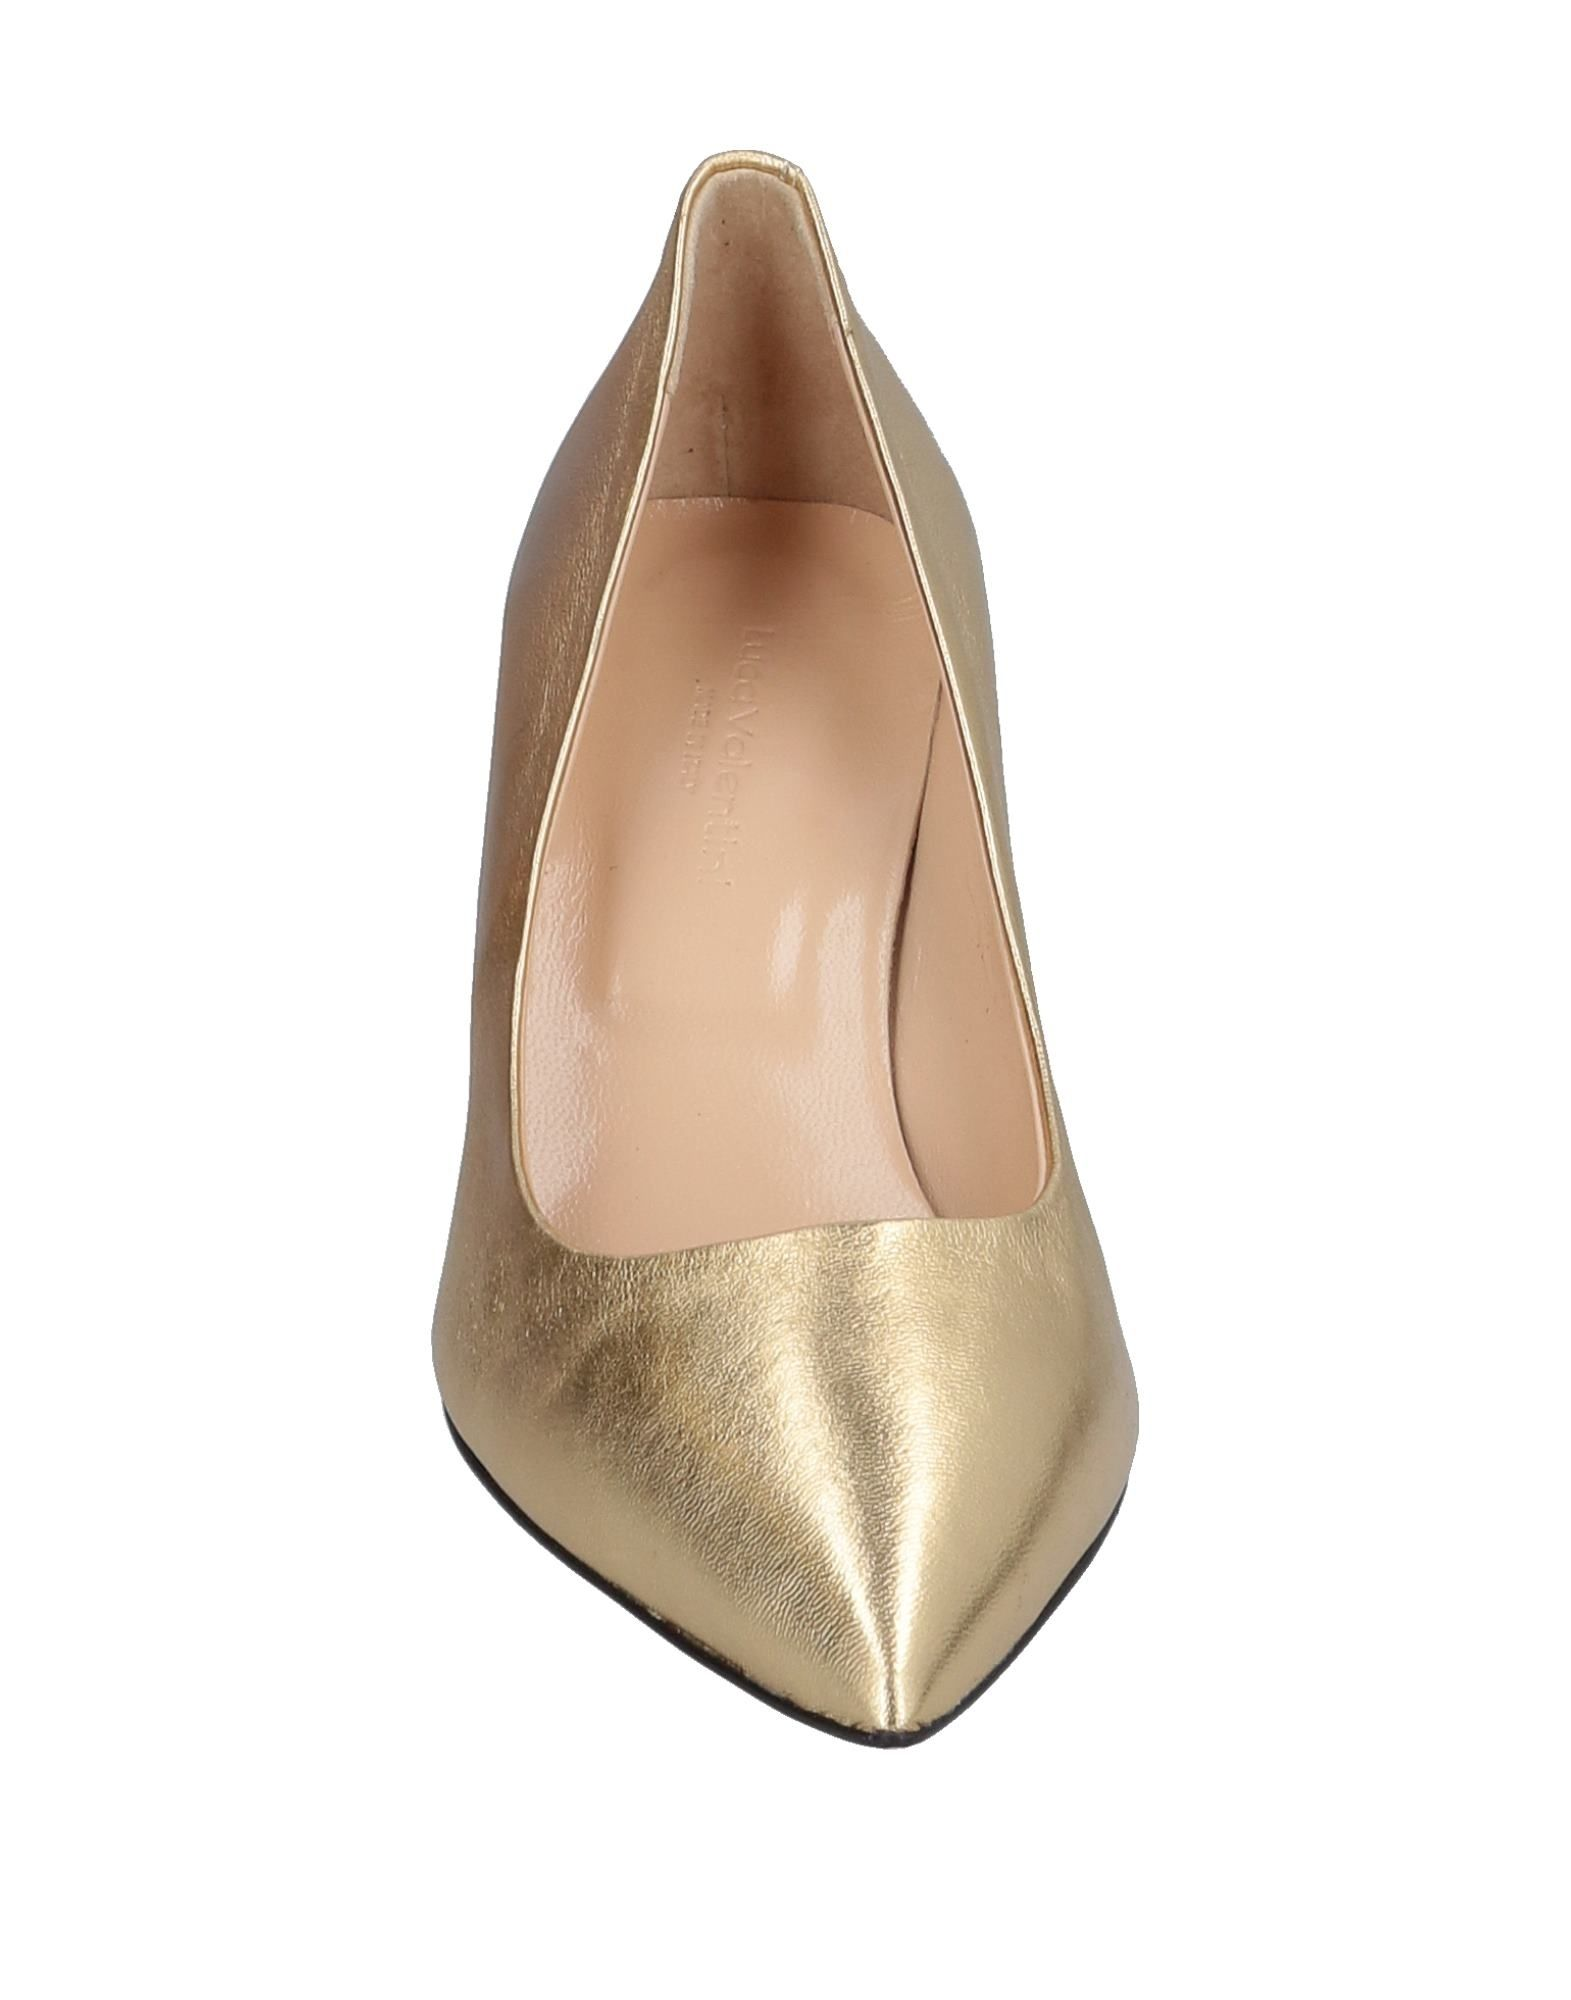 Stilvolle billige Pumps Schuhe Luca Valentini Pumps billige Damen  11536680KT 28939e